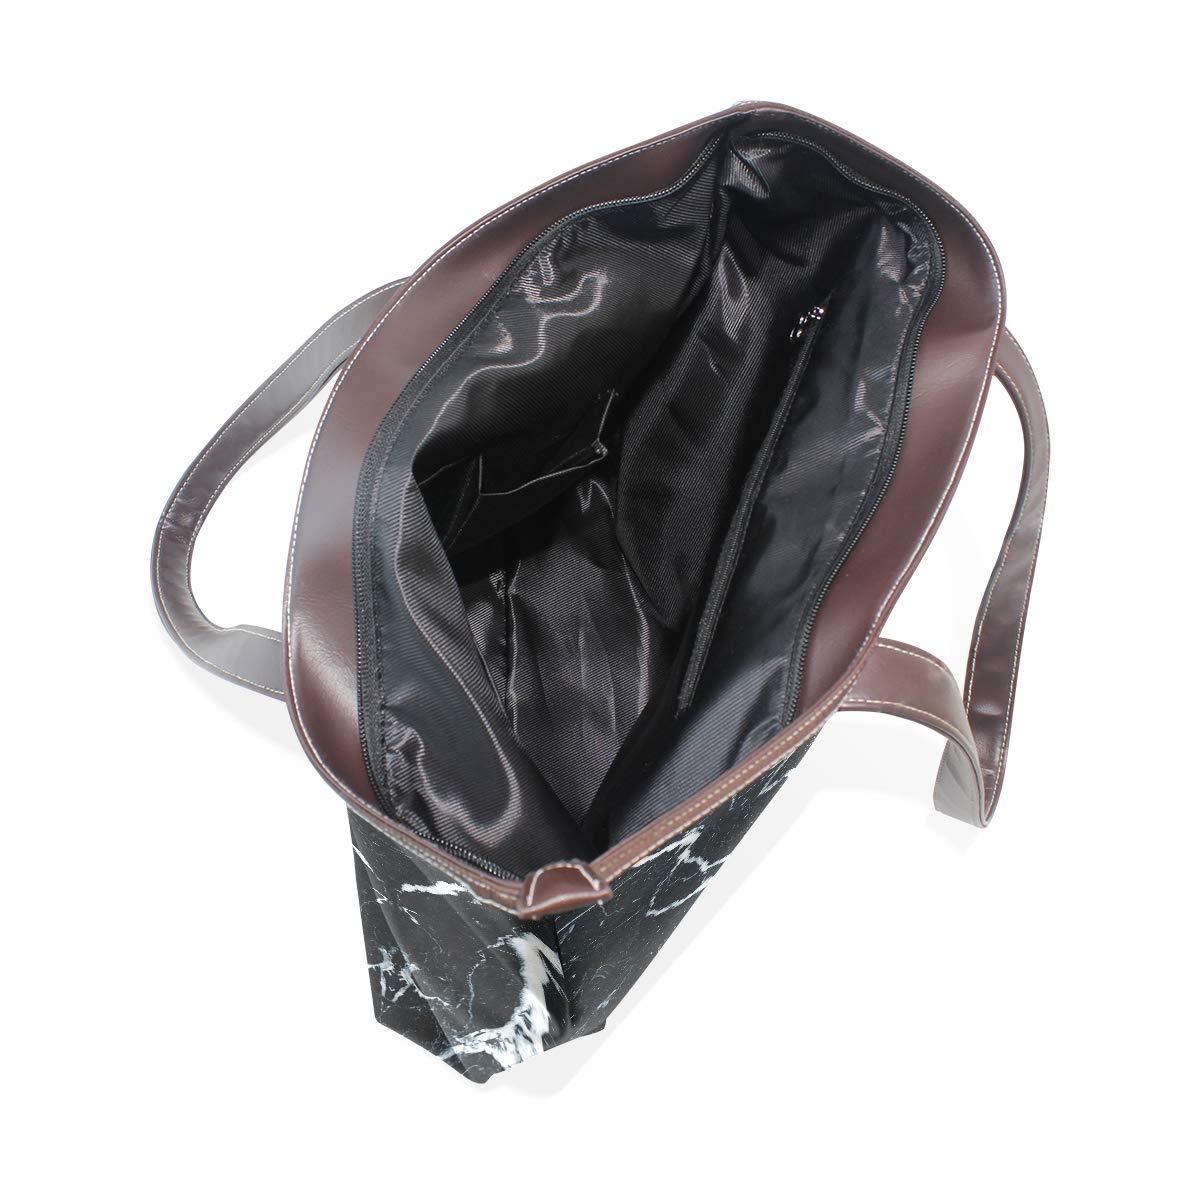 Black White Marble DesignWomens Vintage Leather Tote Urban Style Satchel Tote